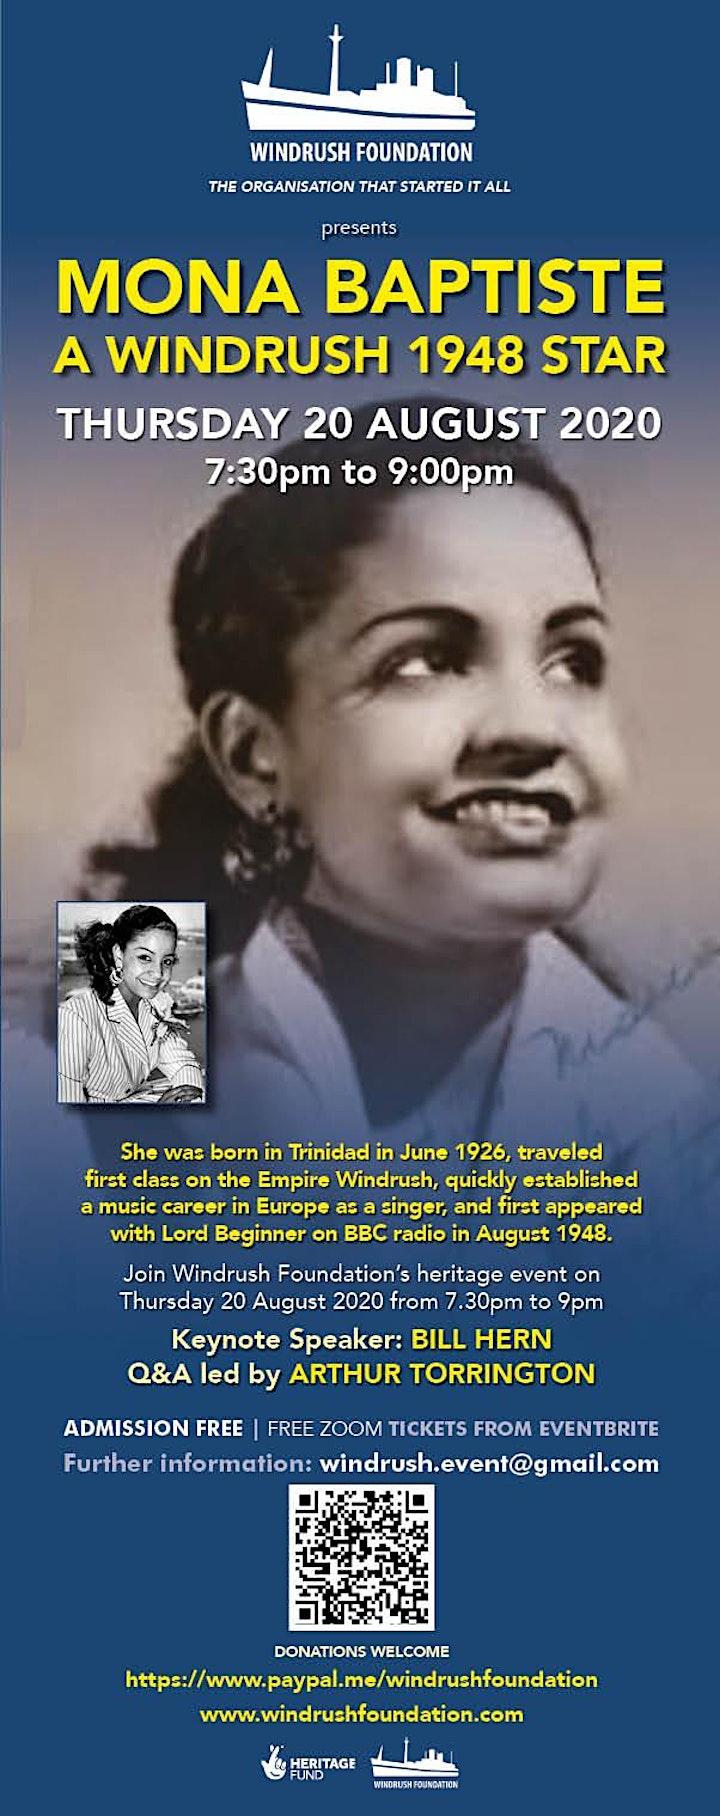 Windrush Foundation presents Mona Baptiste  a Windrush 1948 Star image